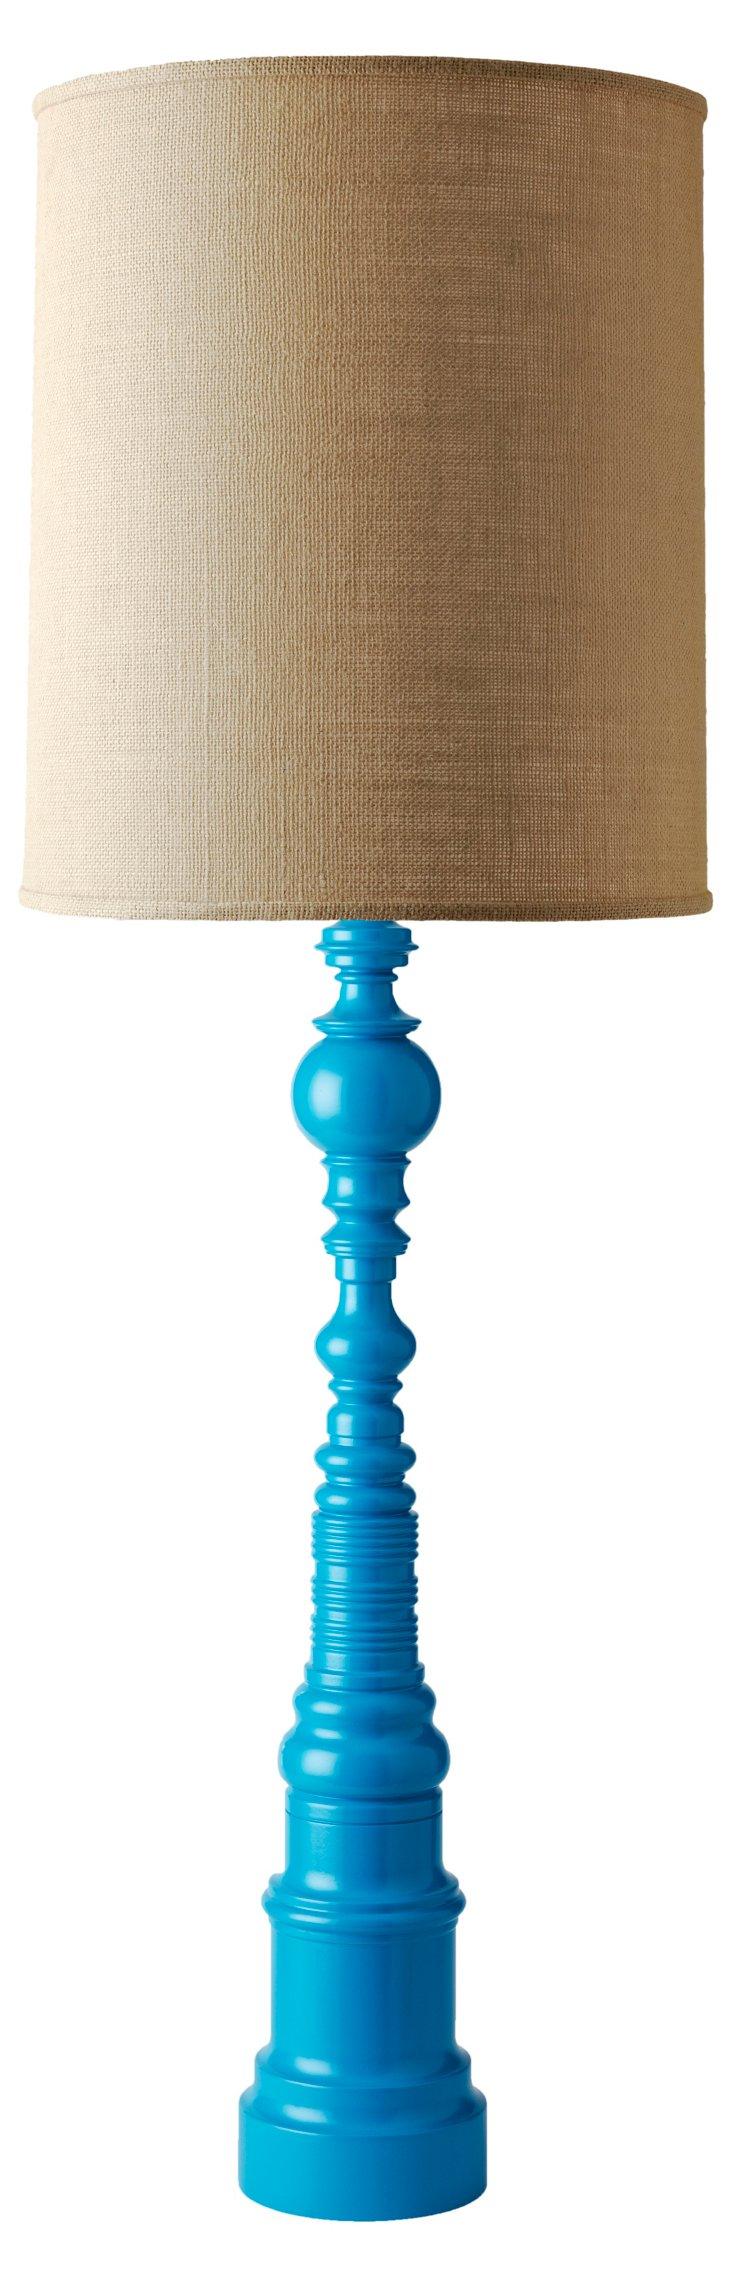 Single Spindle Lamp, Cap Ferrat Bleu